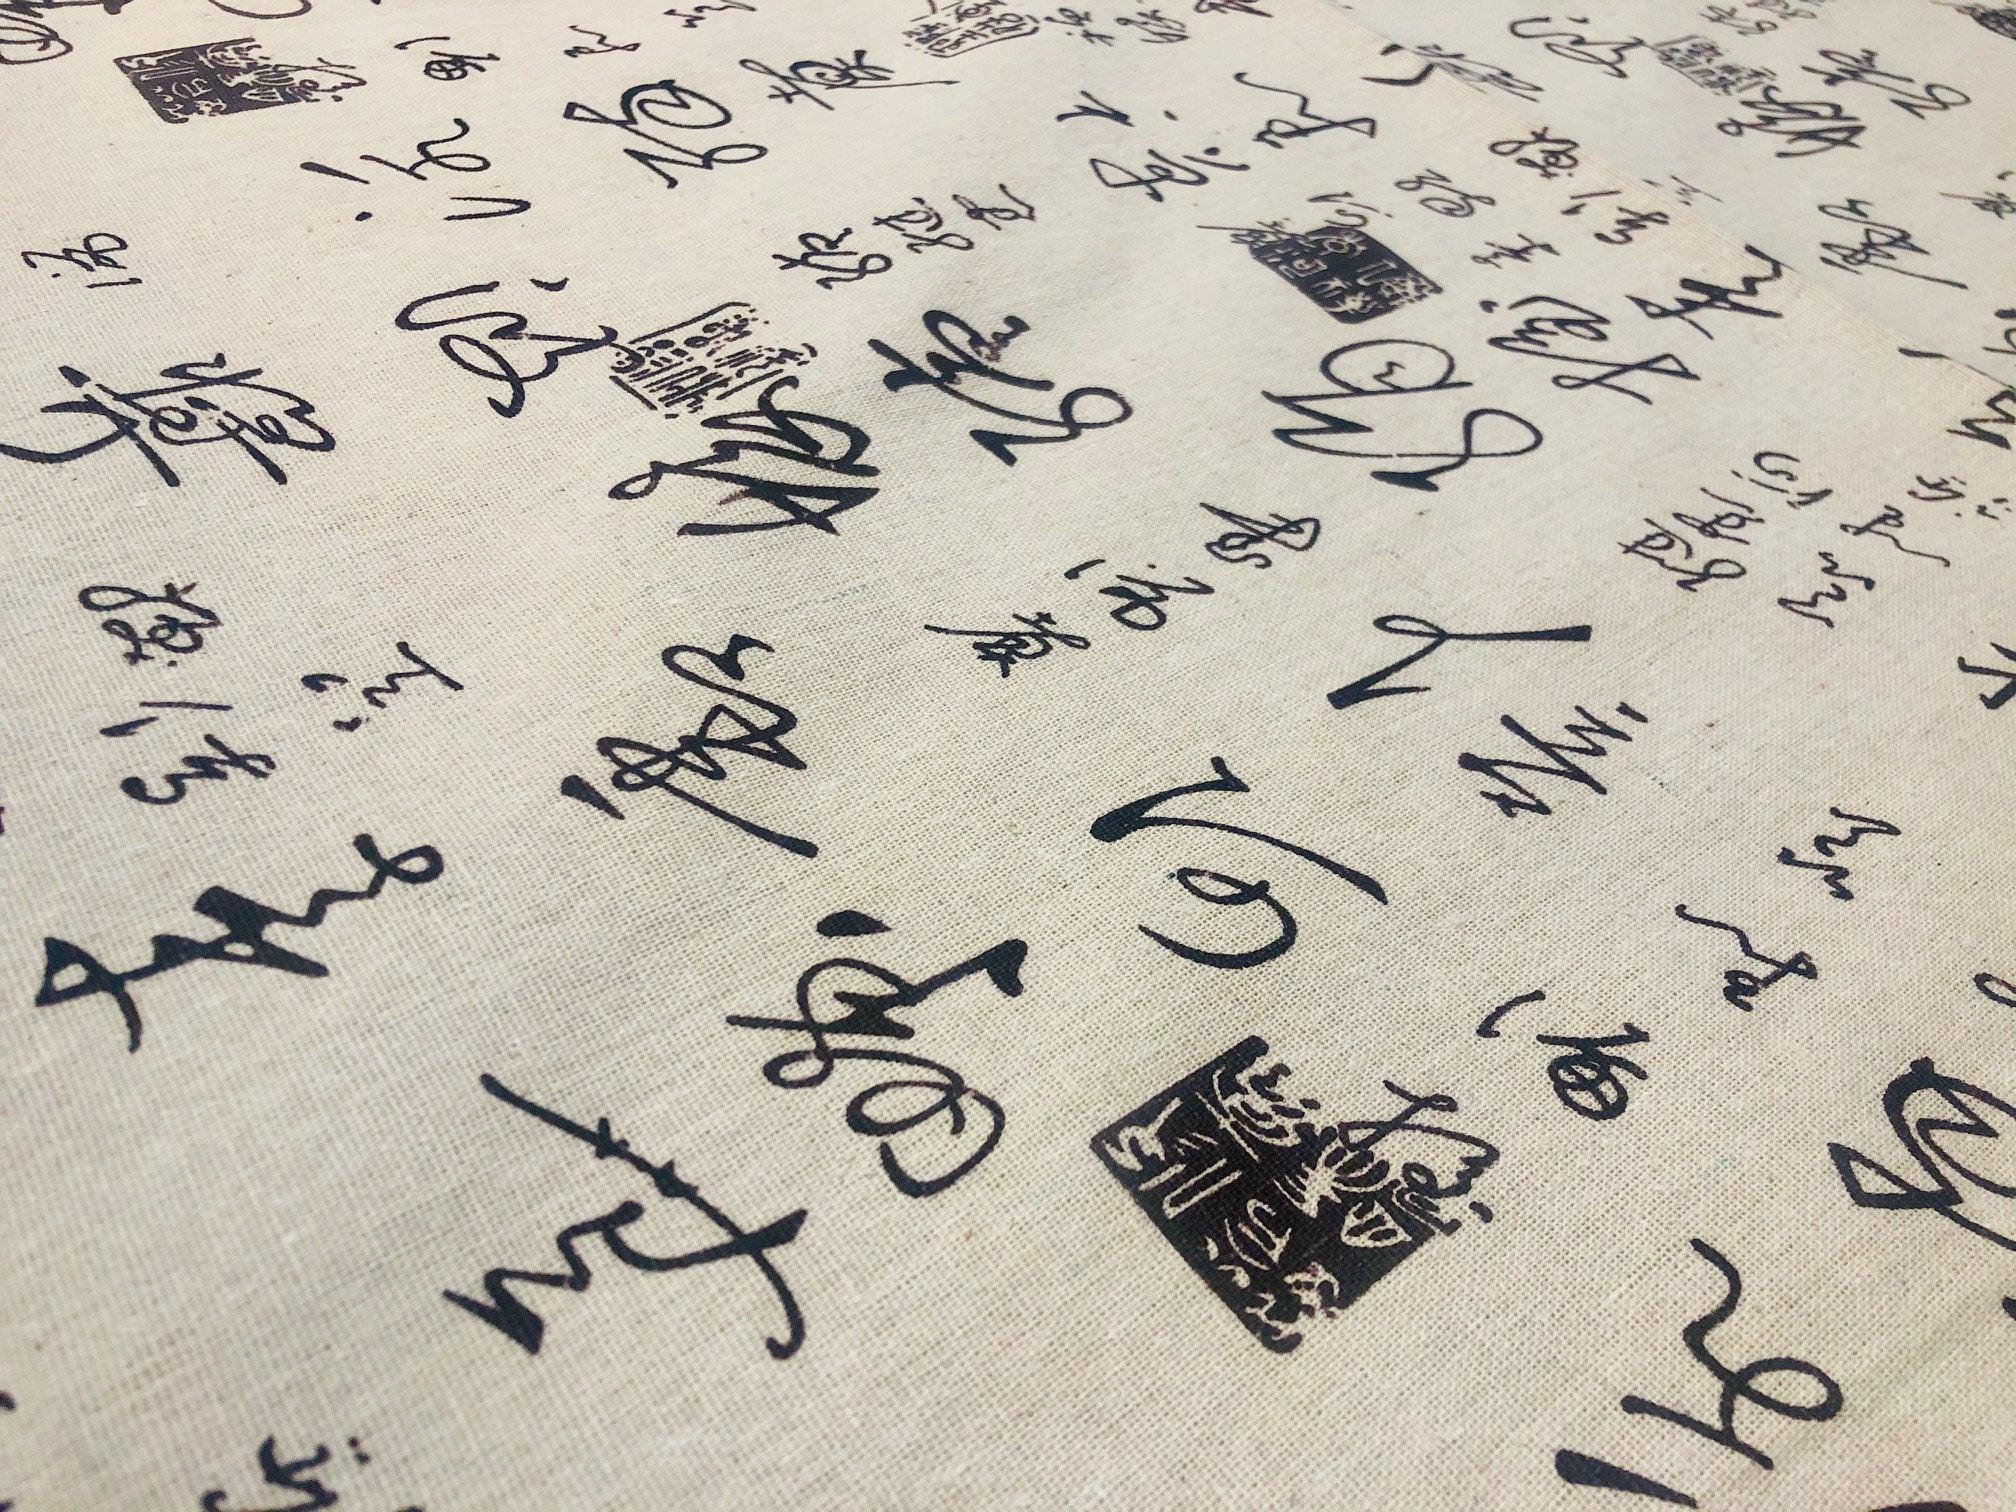 "Asian Symbols Cotton Linen Blend Fabric Parchment Vintage Look Printed Material Home Decor Curtain Upholstery- 59""/150cm Wide Canvas"